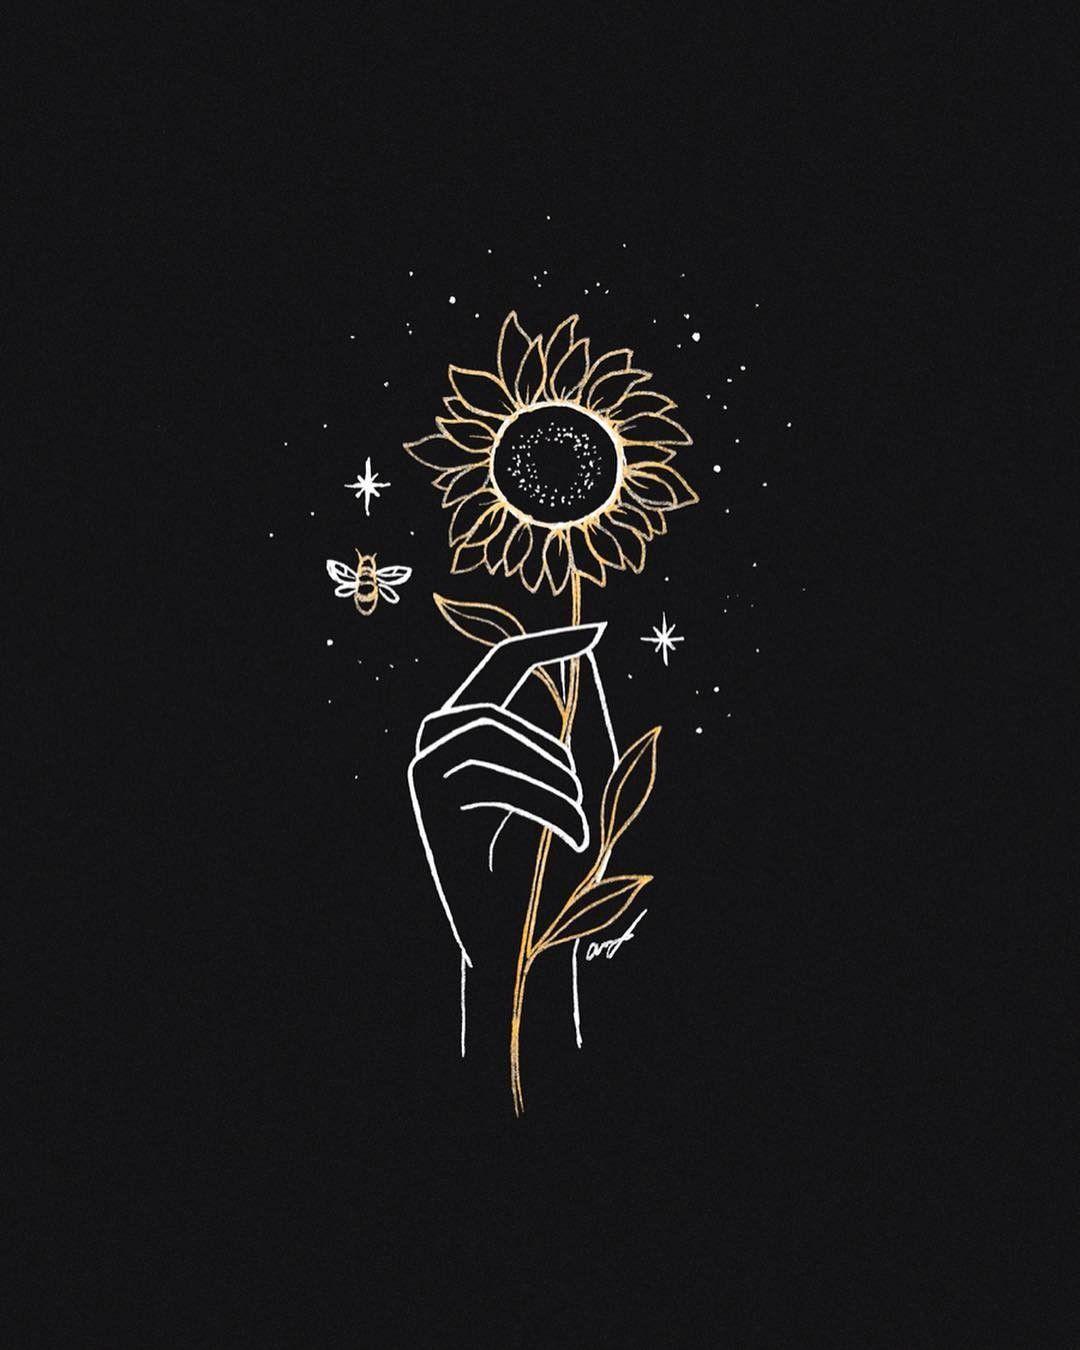 Pin By Gabriella On Designs Art Sunflower Wallpaper Cute